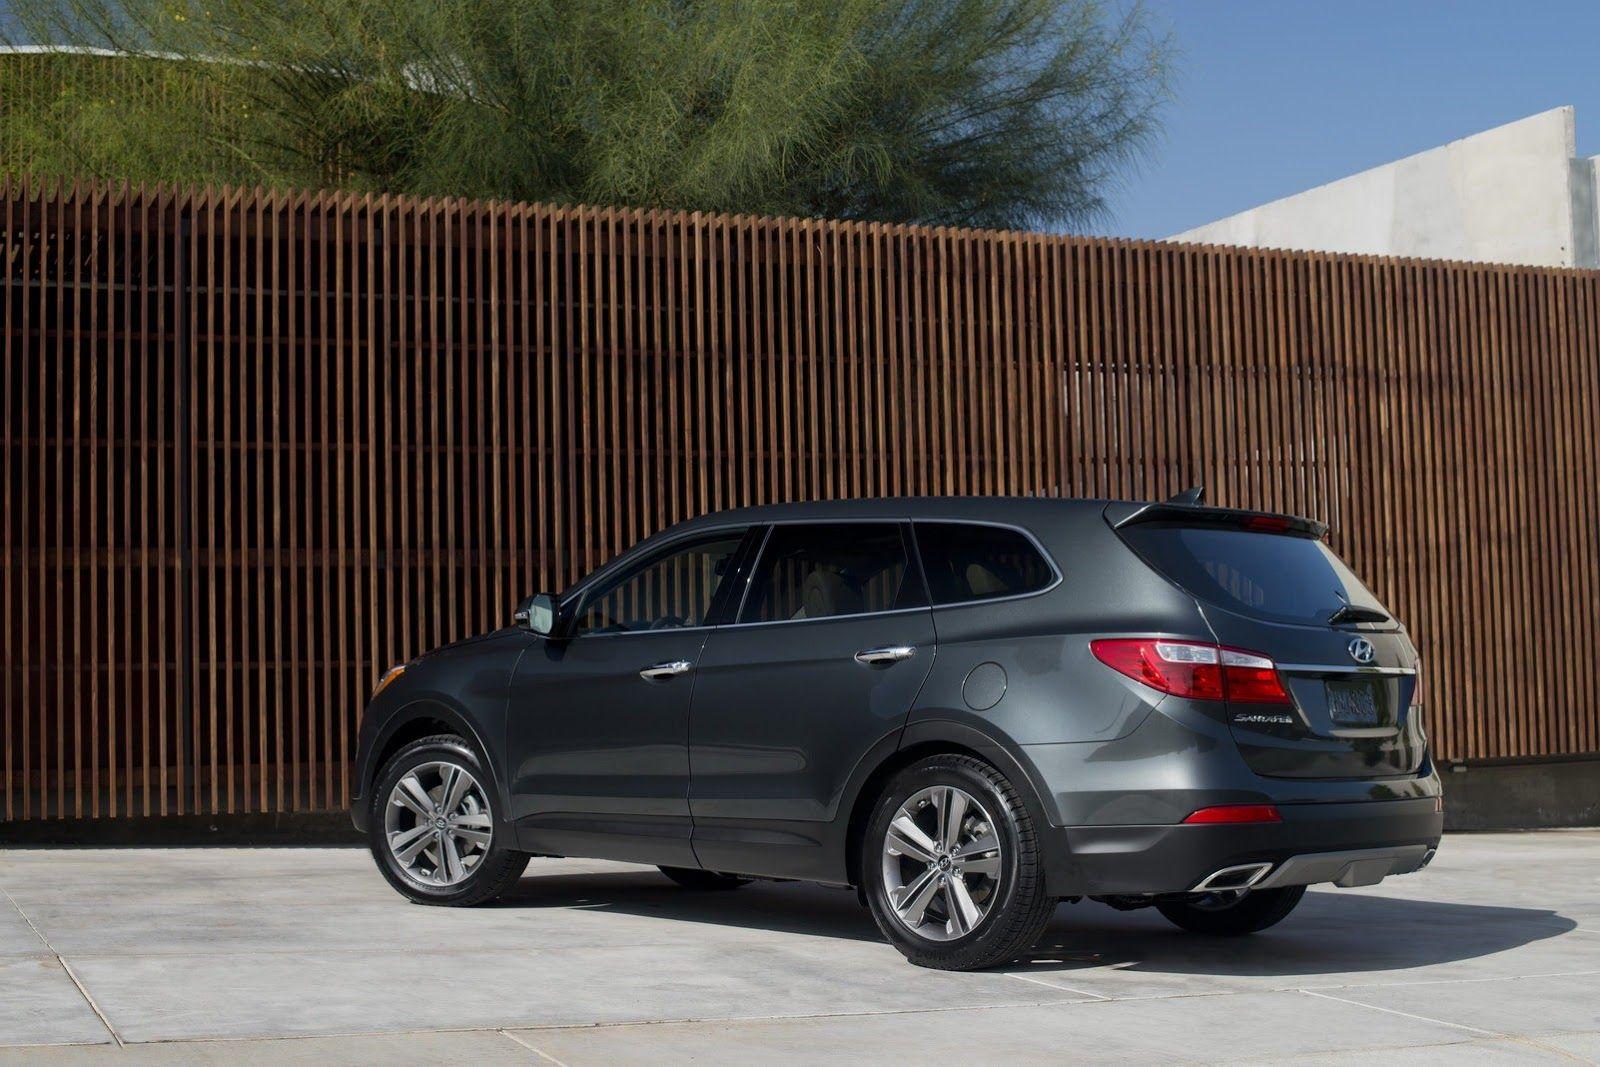 2012 6/7 Penger Hyundai Santa Fe | Hitting the road | Pinterest